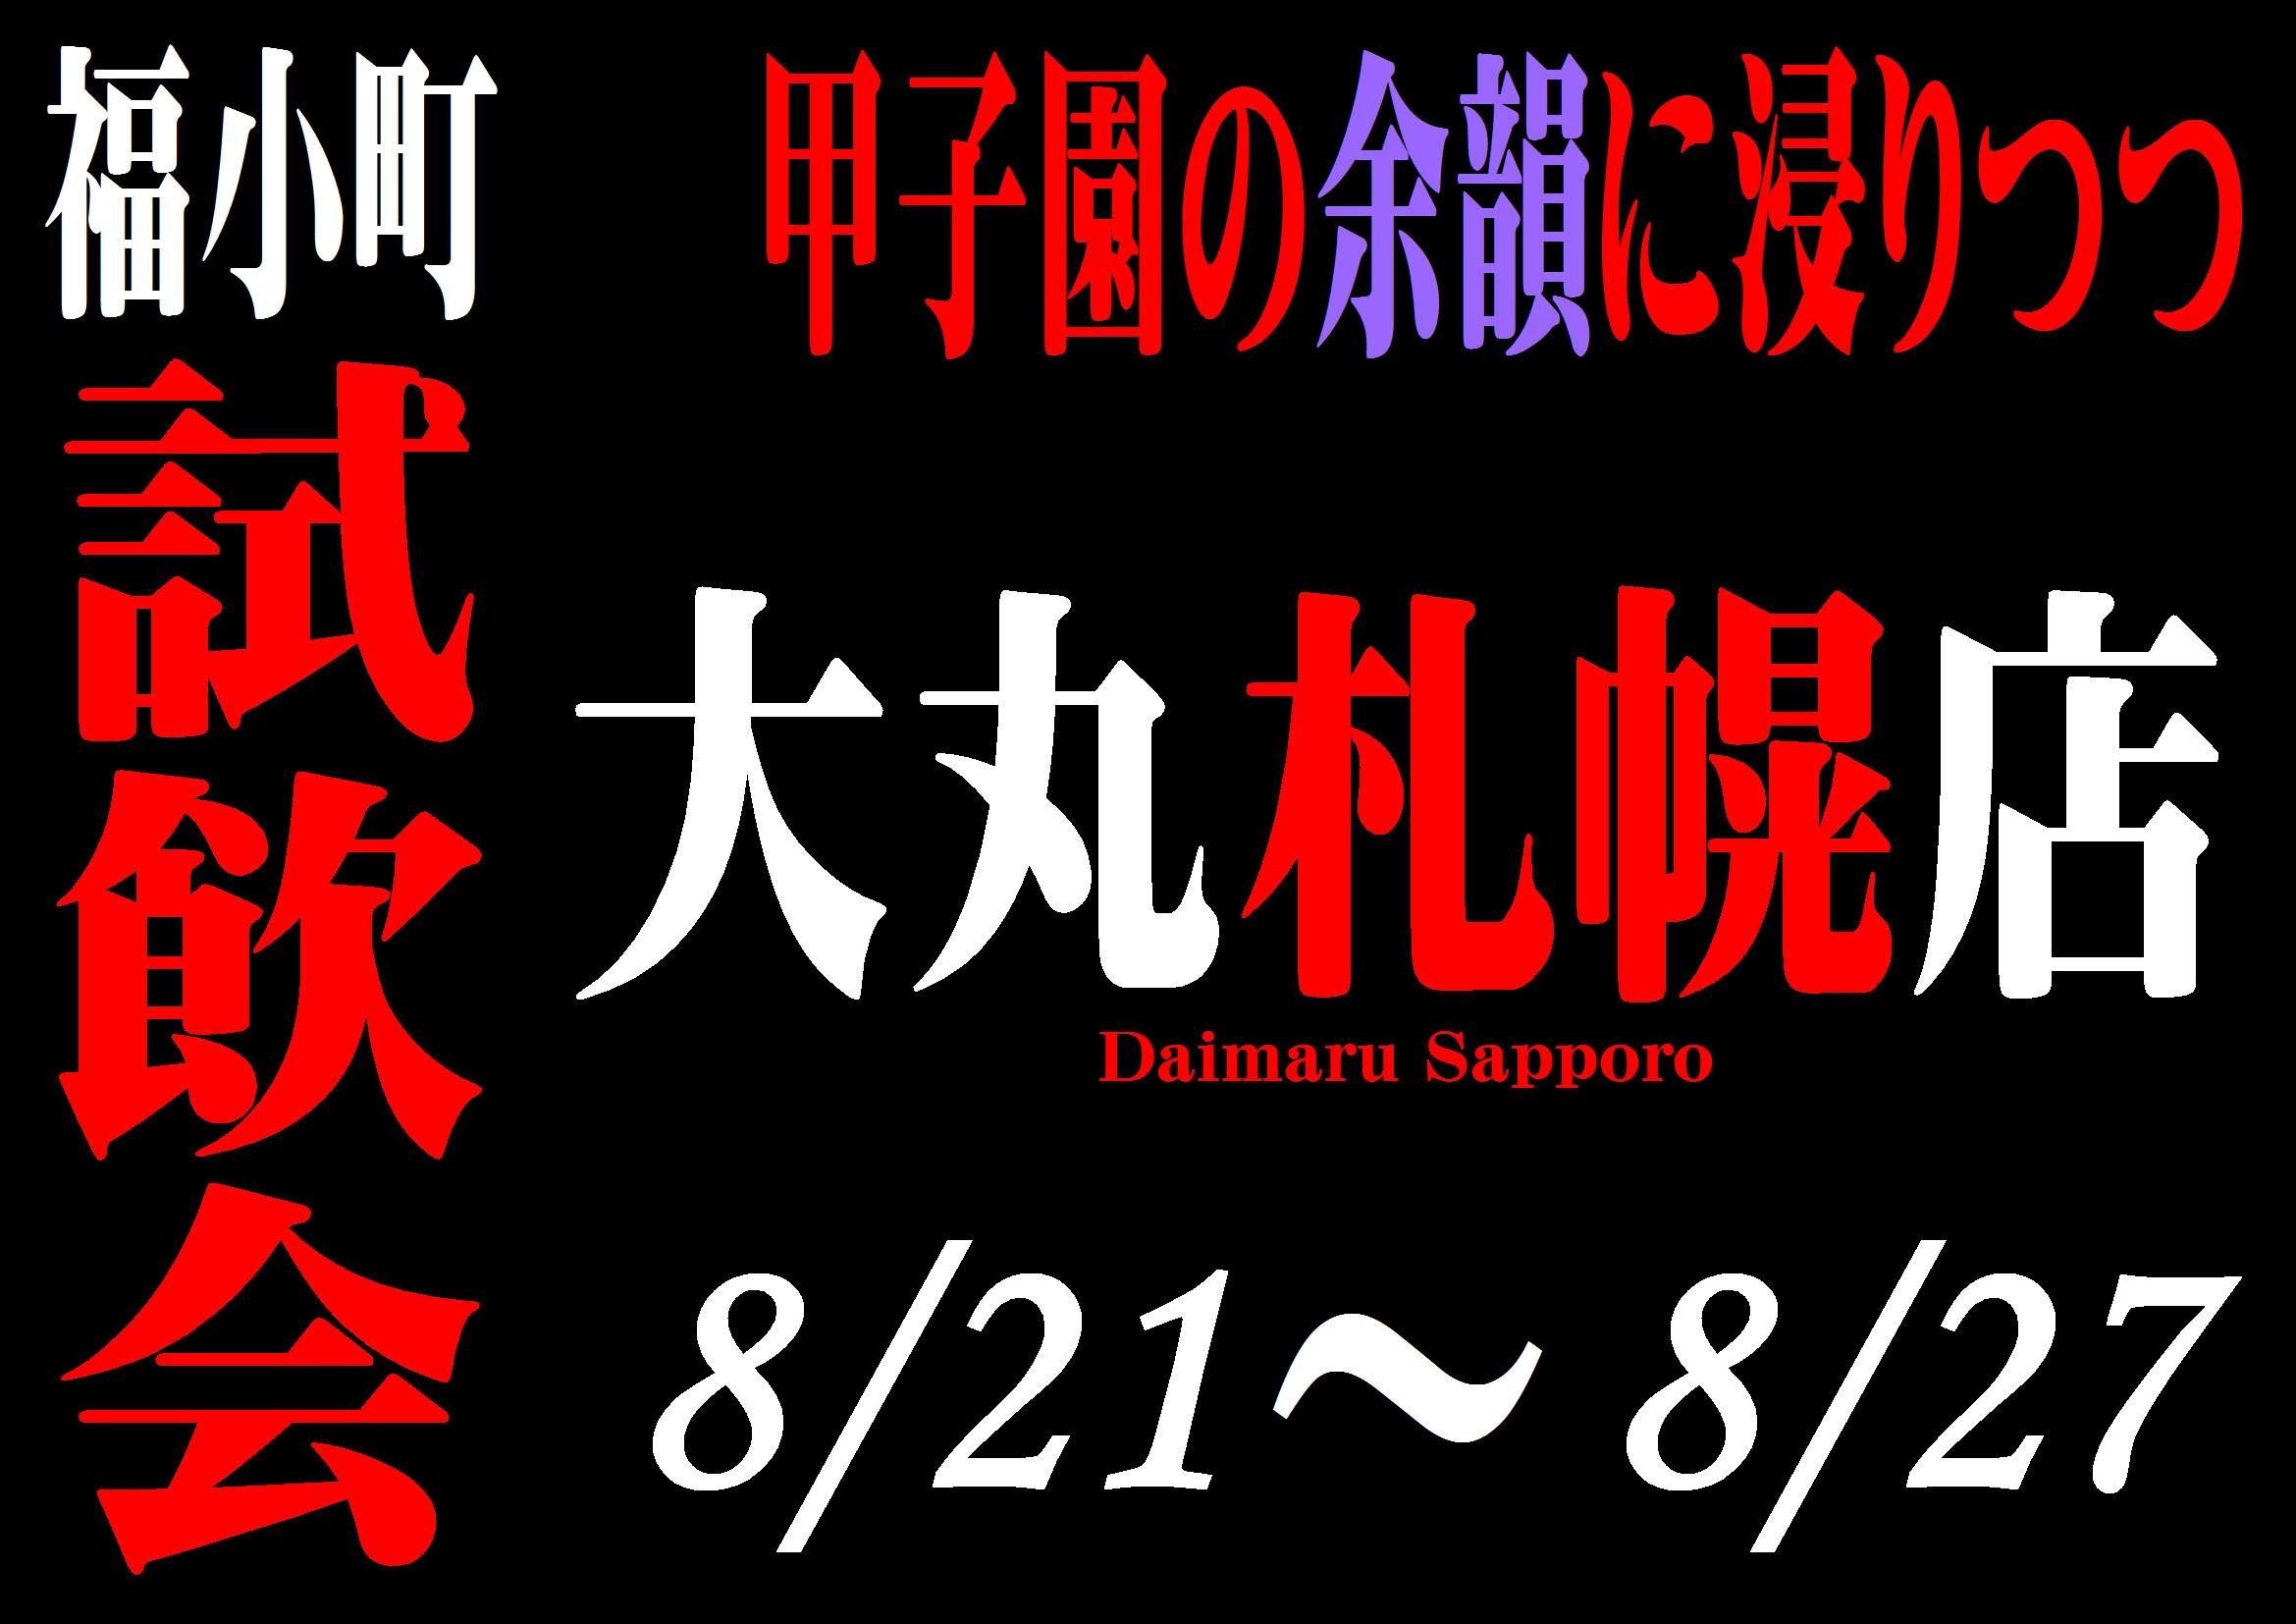 http://www.fukukomachi.com/blog/photo/20180822-2.JPG